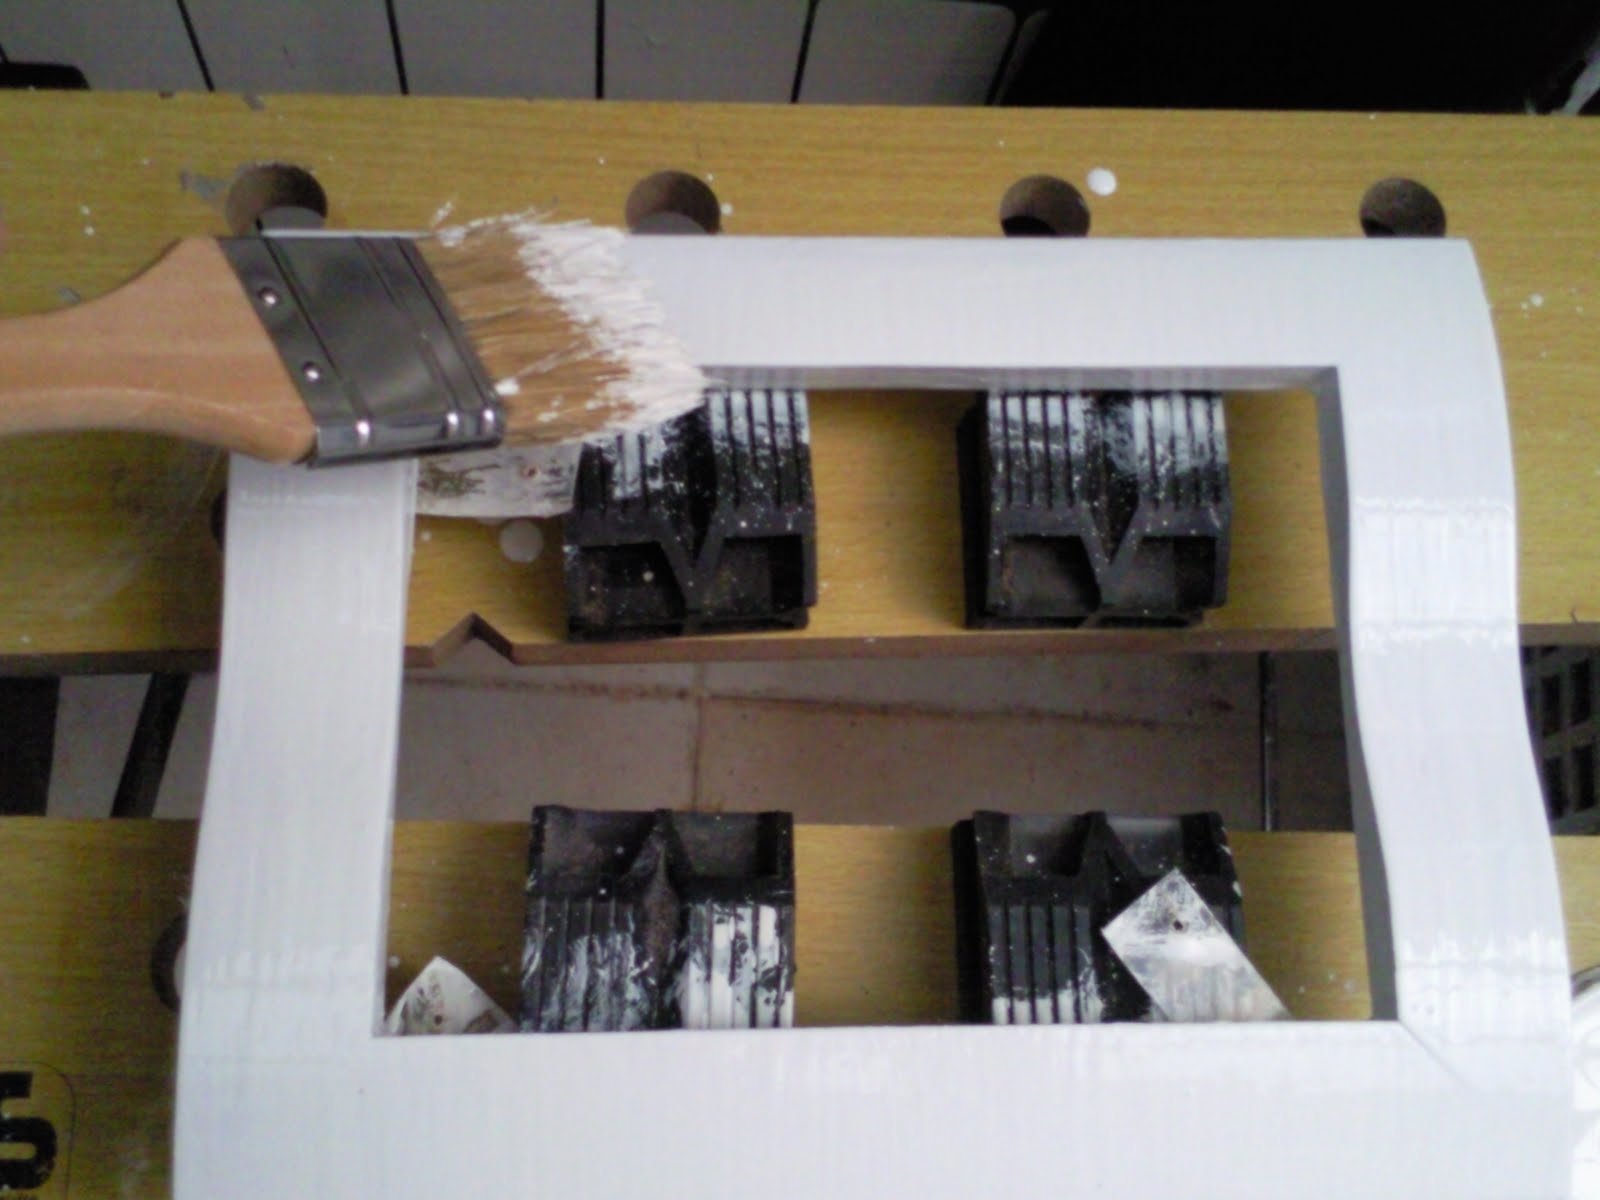 Pintar muebles en blanco dise os arquitect nicos for Pintar mueble lacado